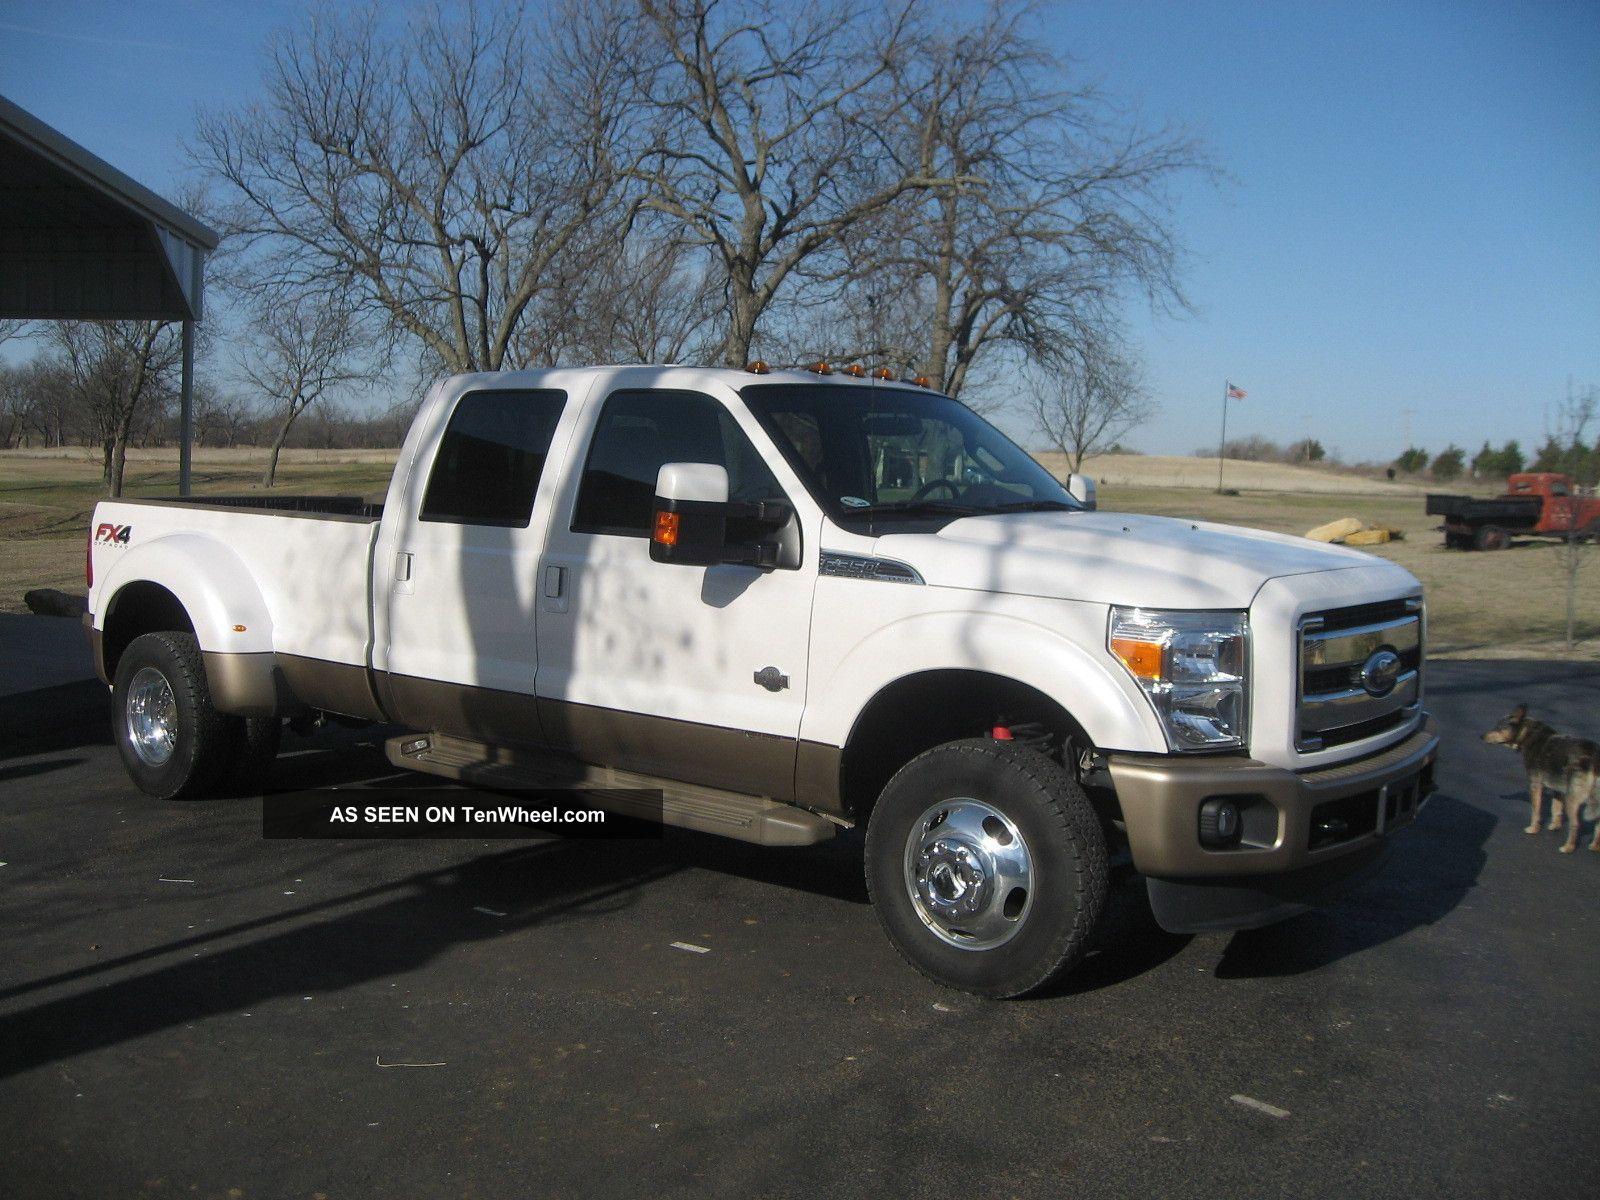 2012 ford f350 king ranch 4x4 diesel. Black Bedroom Furniture Sets. Home Design Ideas